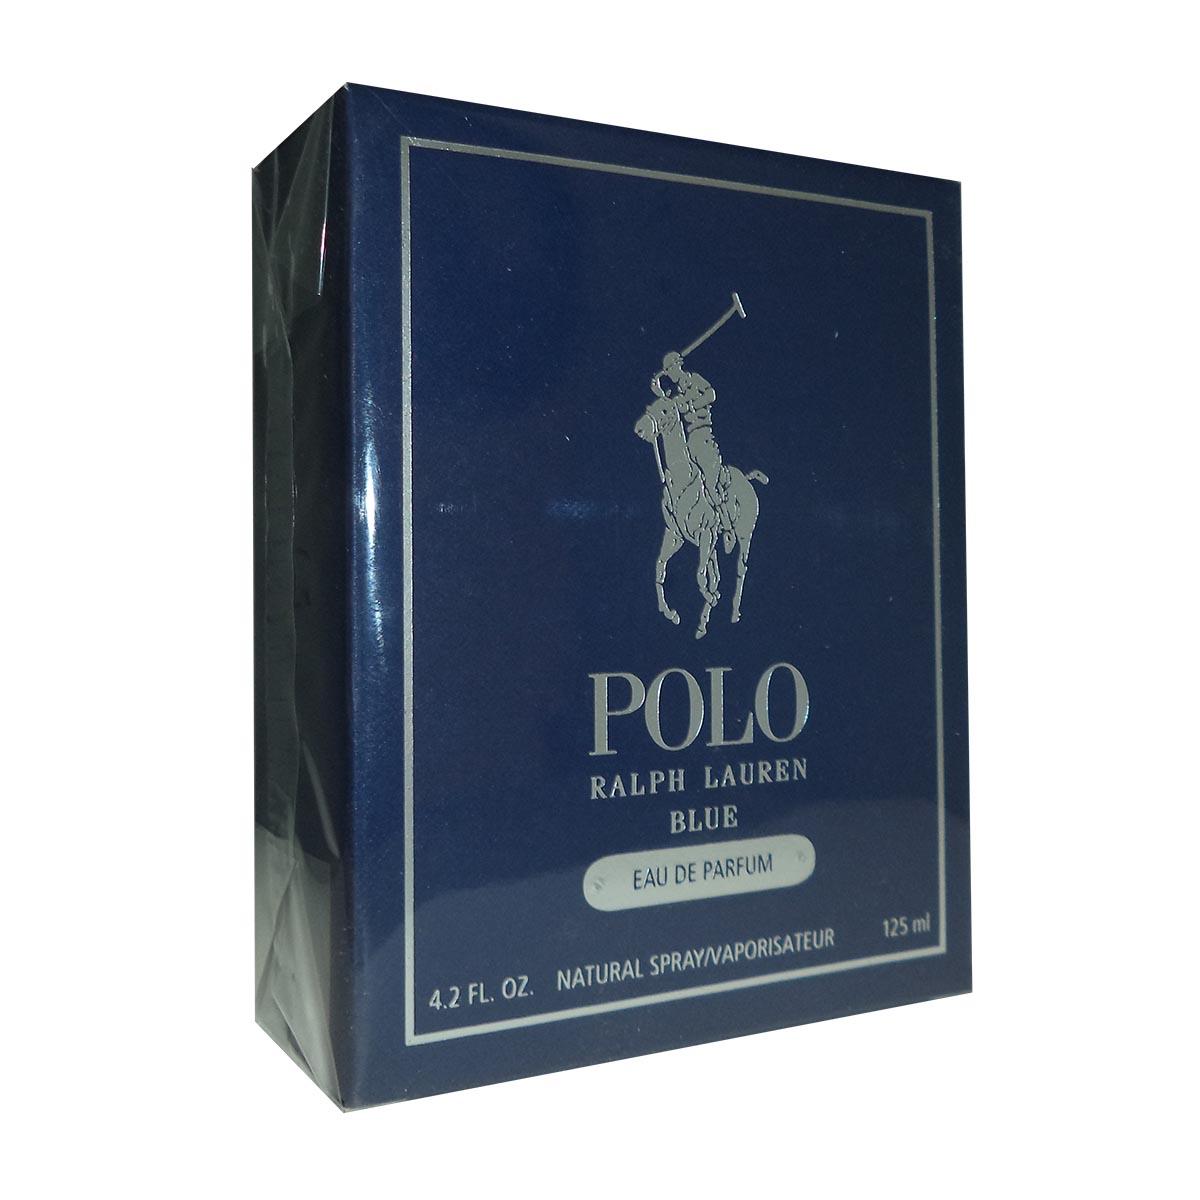 Ralph lauren polo blue eau de parfum 125ml vaporizador